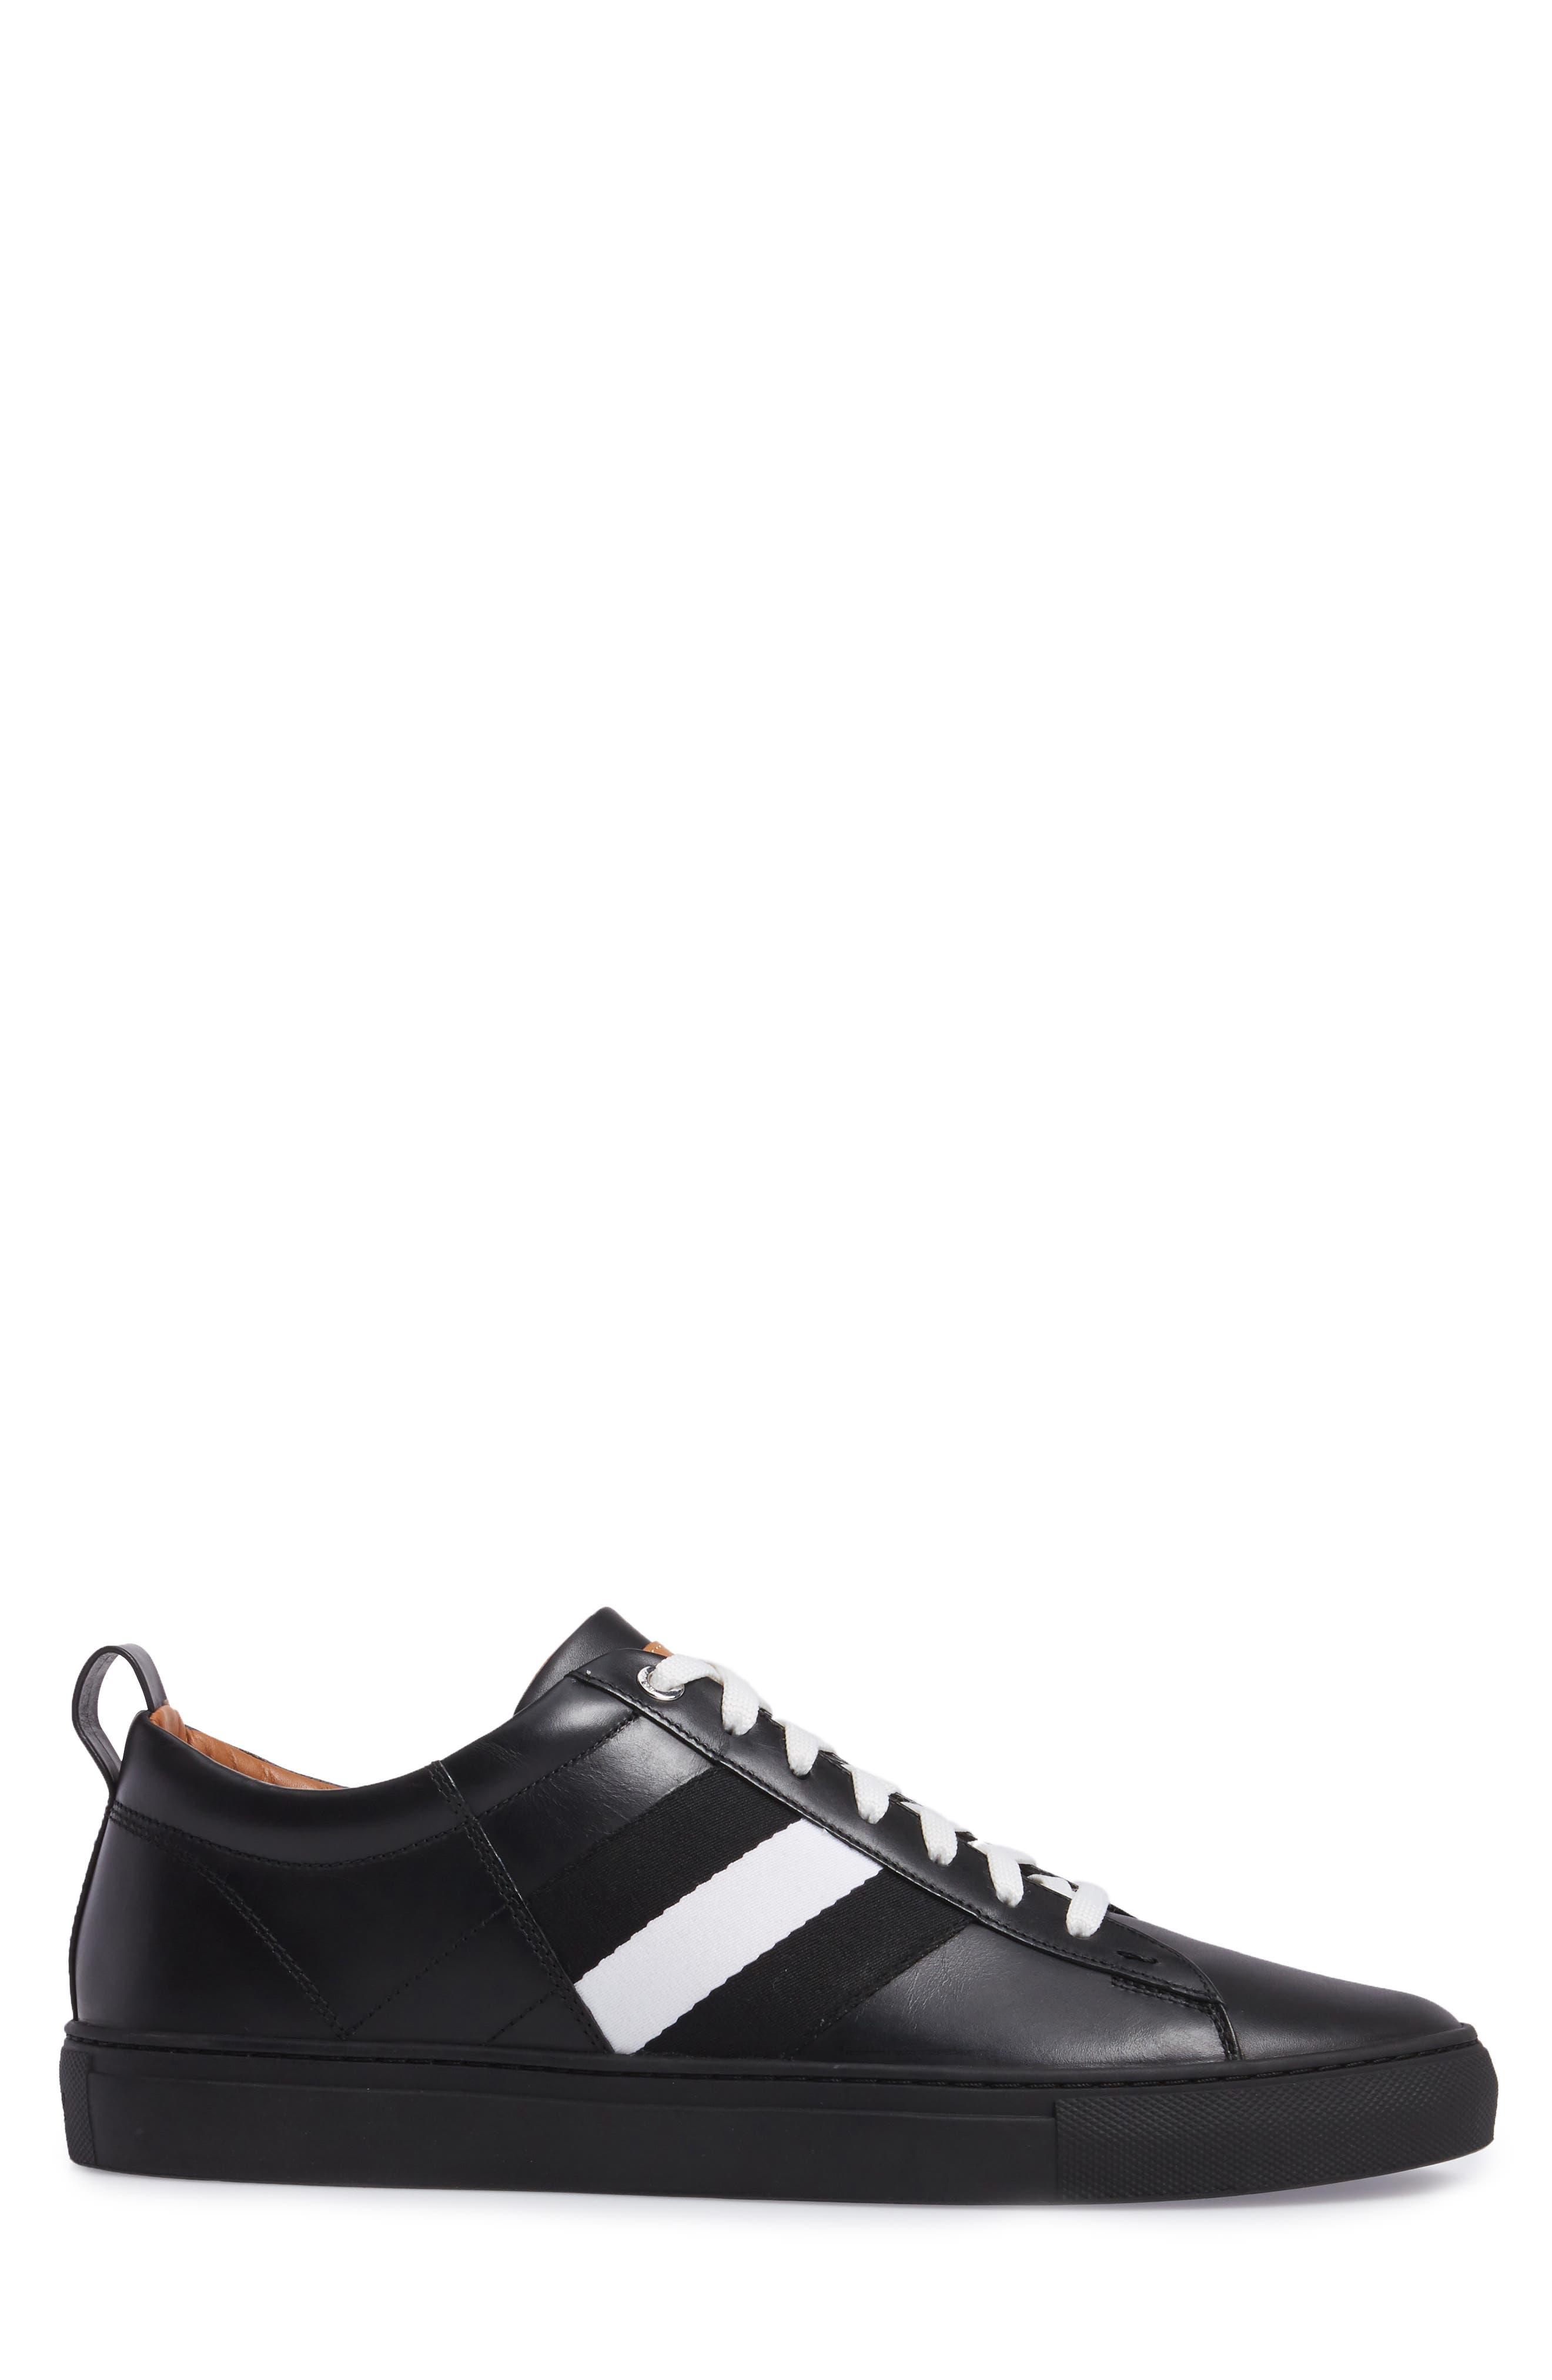 'Helvio' Sneaker,                             Alternate thumbnail 10, color,